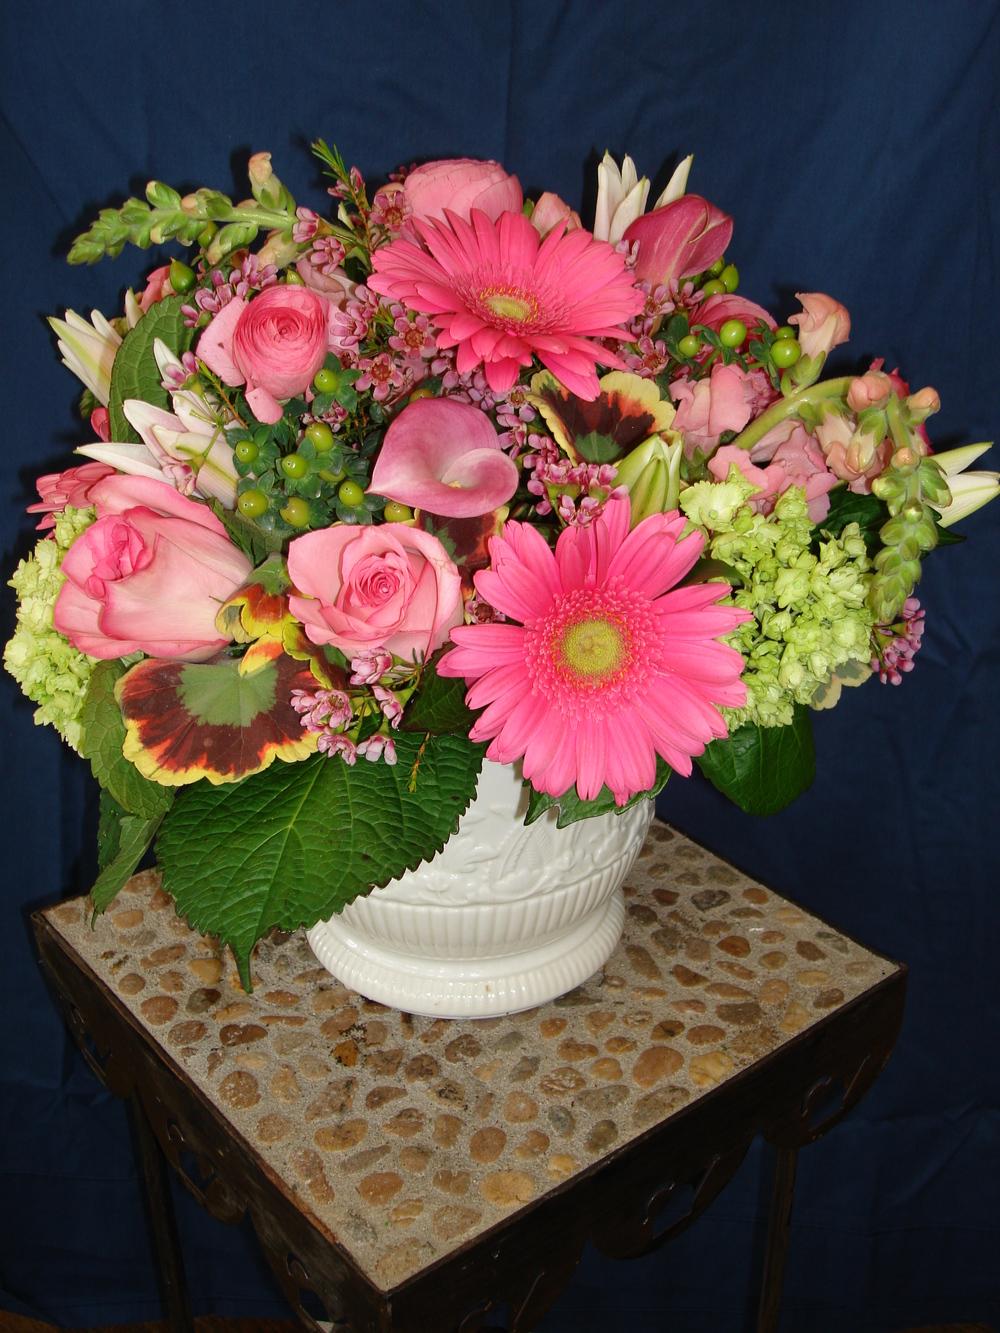 Floral Arrangements 022.jpg